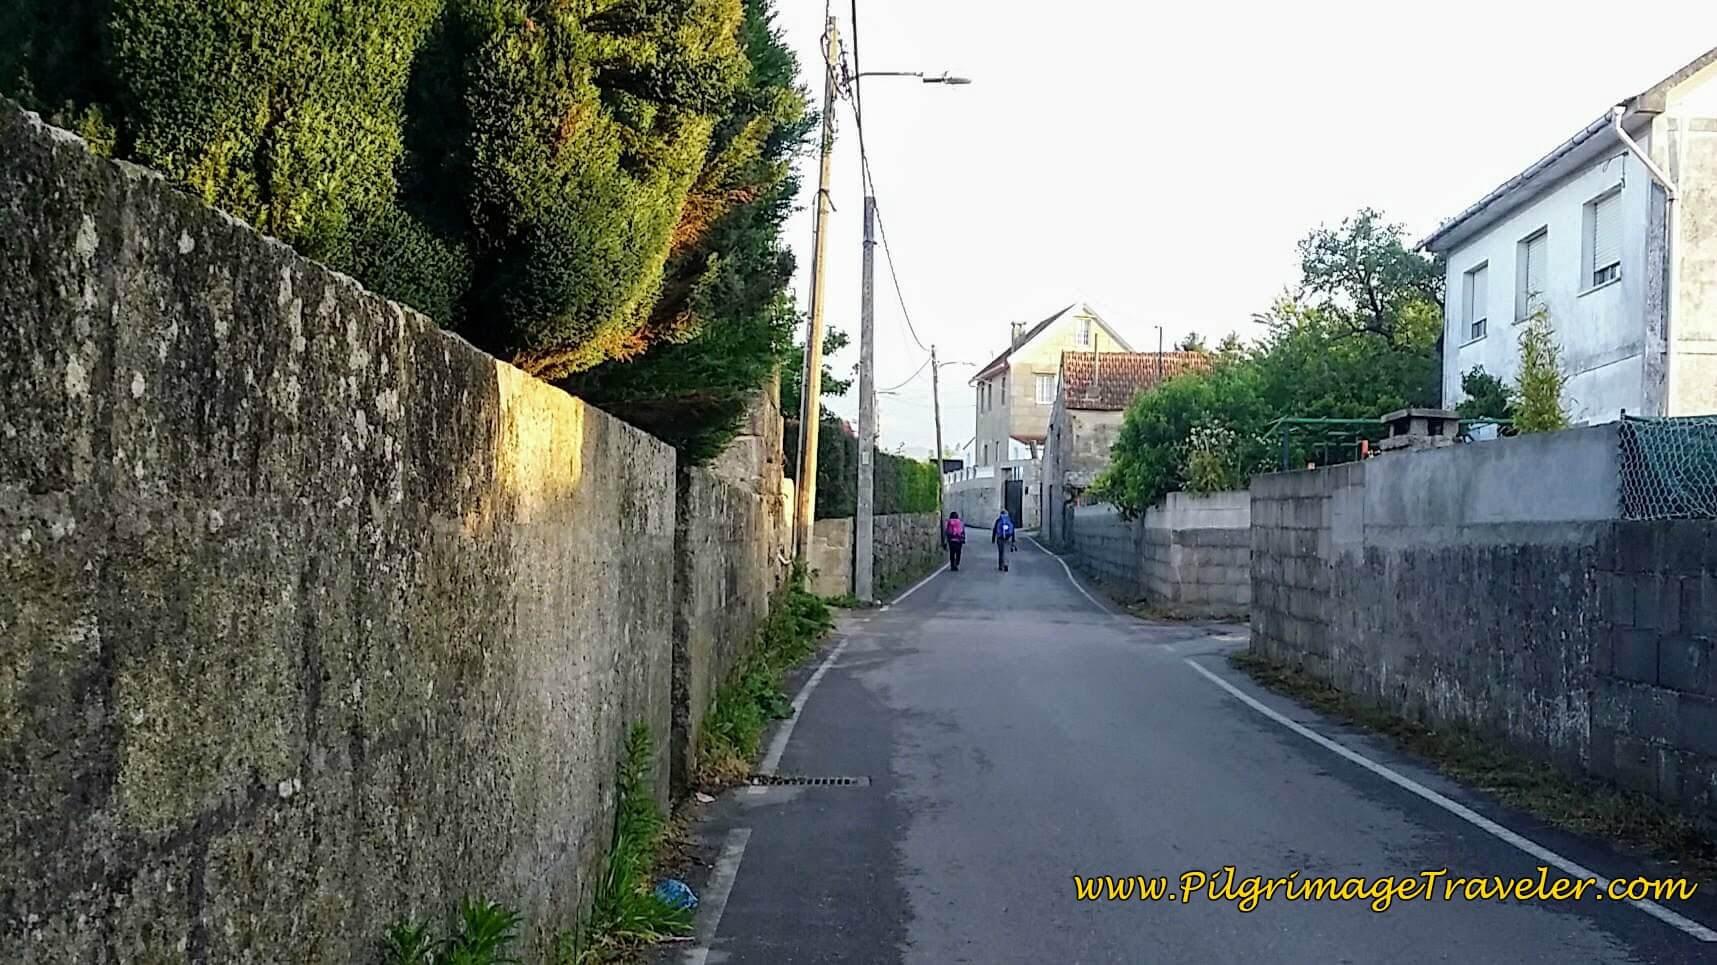 Leaving Redondela on the Camiño do Esteiro, day twenty-two on the Camino Portugués